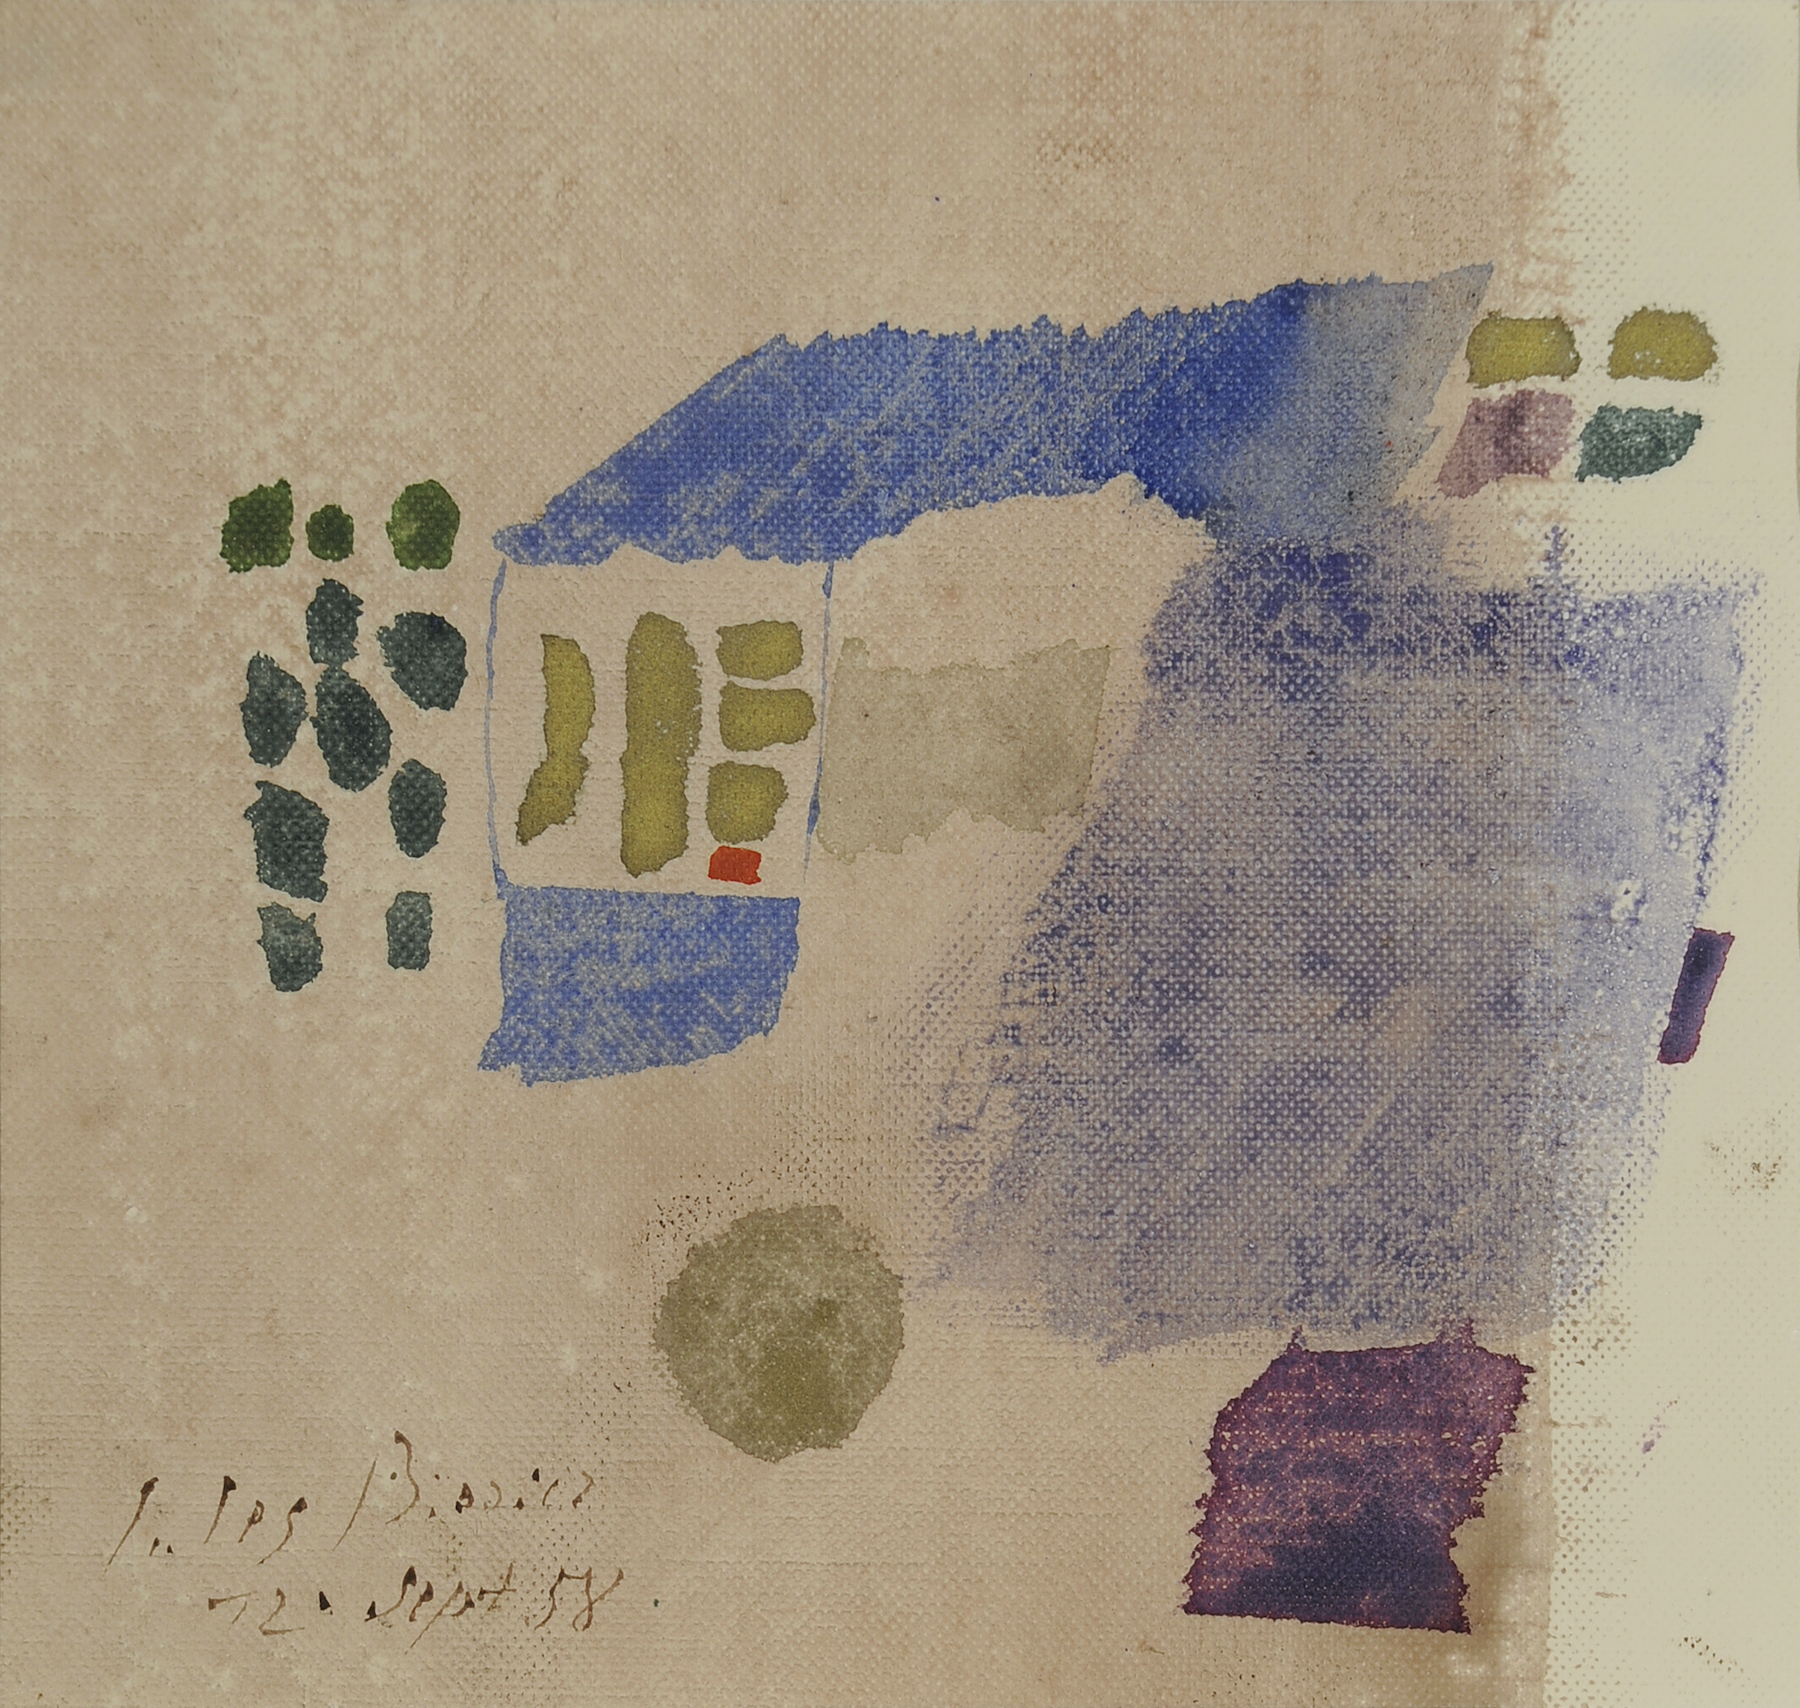 Galerie Maulberger Julius Bissier 1958